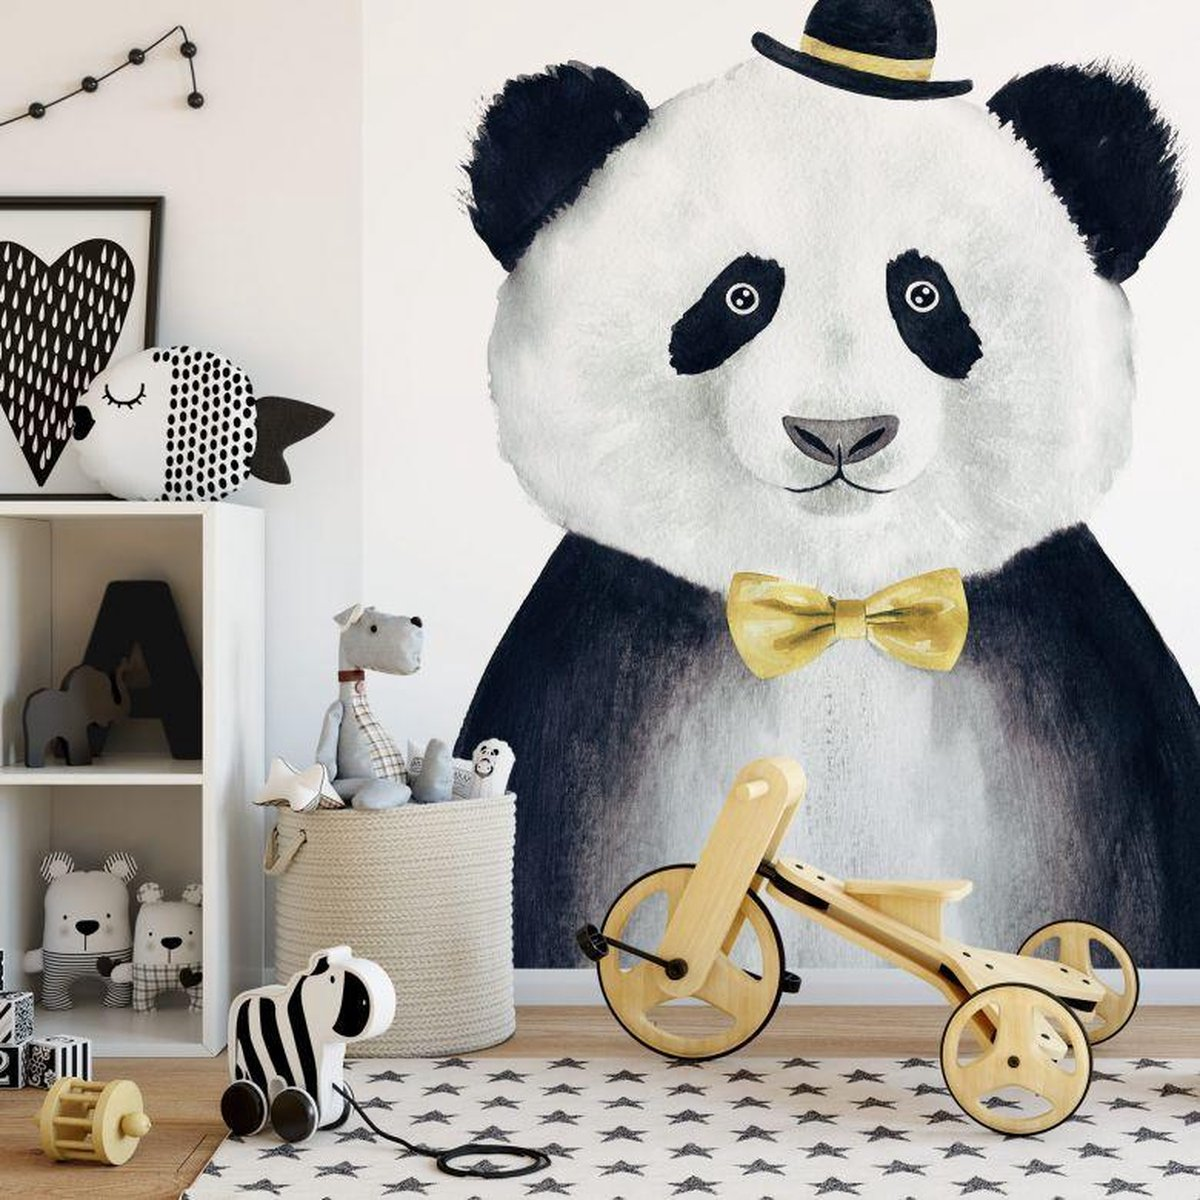 Fotobehang Cuddly Gentleman 192x260 cm - topkwaliteit vliesbehang - Panda Behang Kinderkamer - WallArt